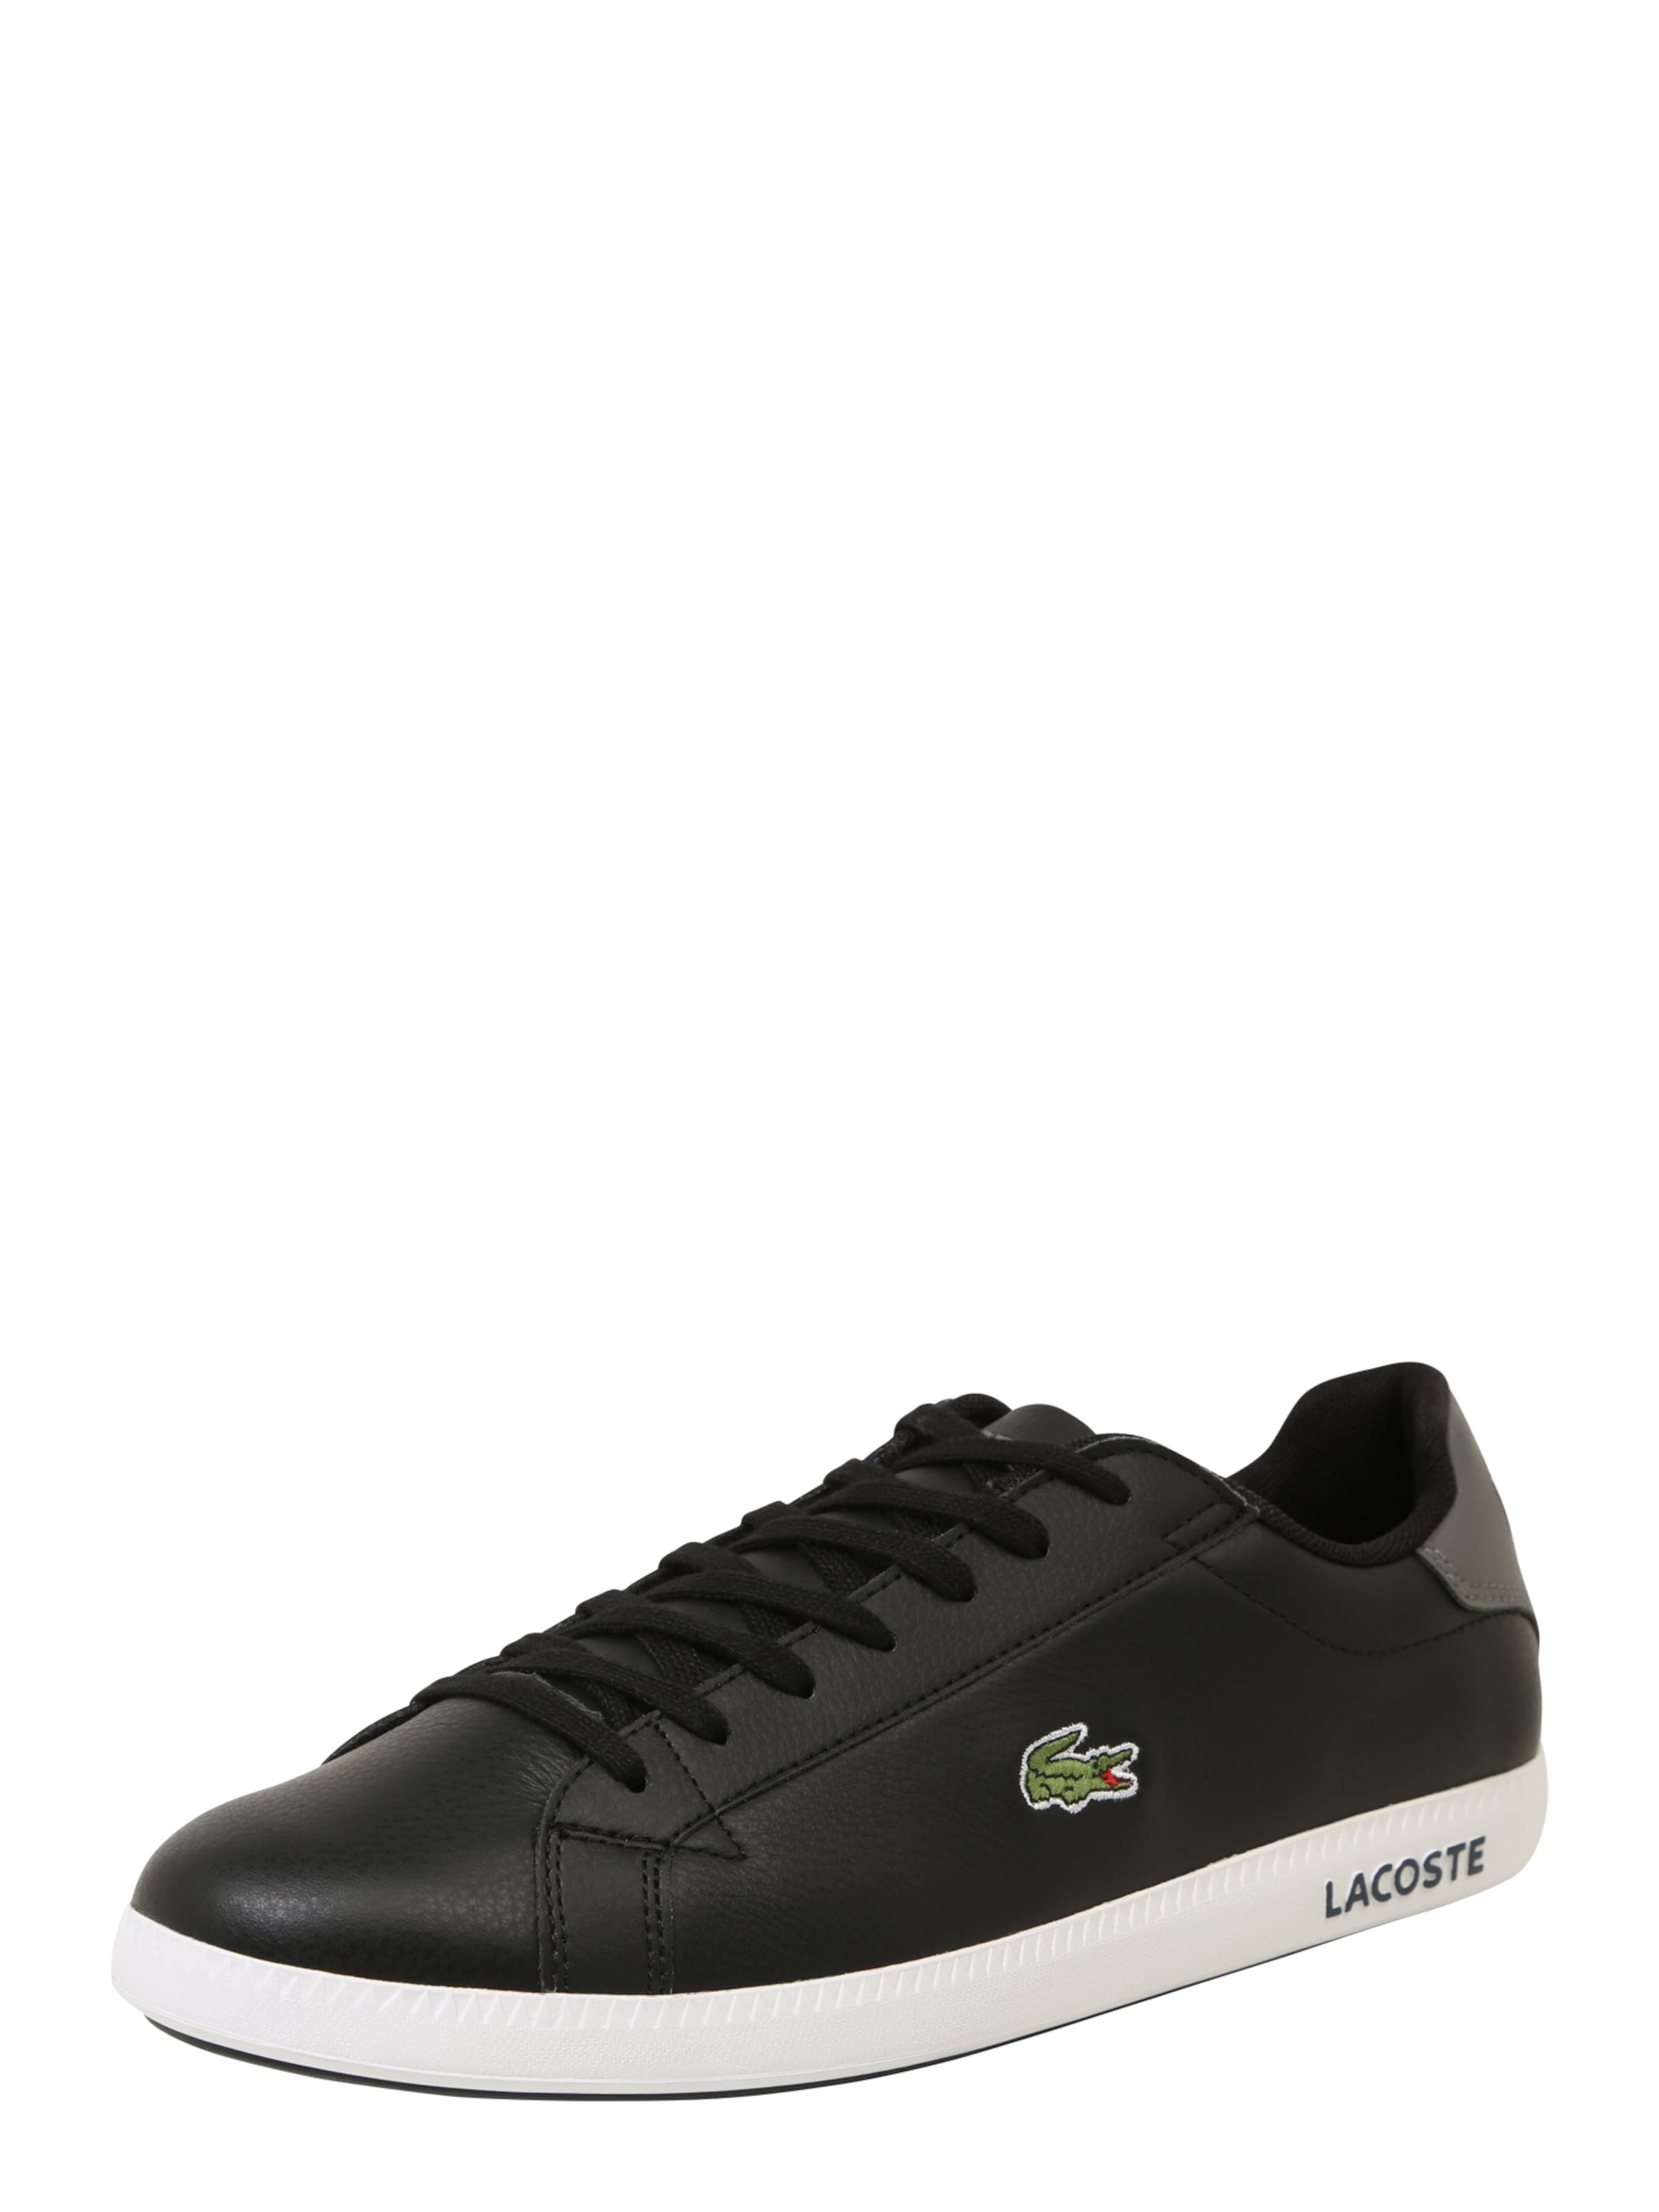 Haltbare Mode billige Schuhe LACOSTE | Sneaker 'GRADUATE' Schuhe Gut getragene Schuhe